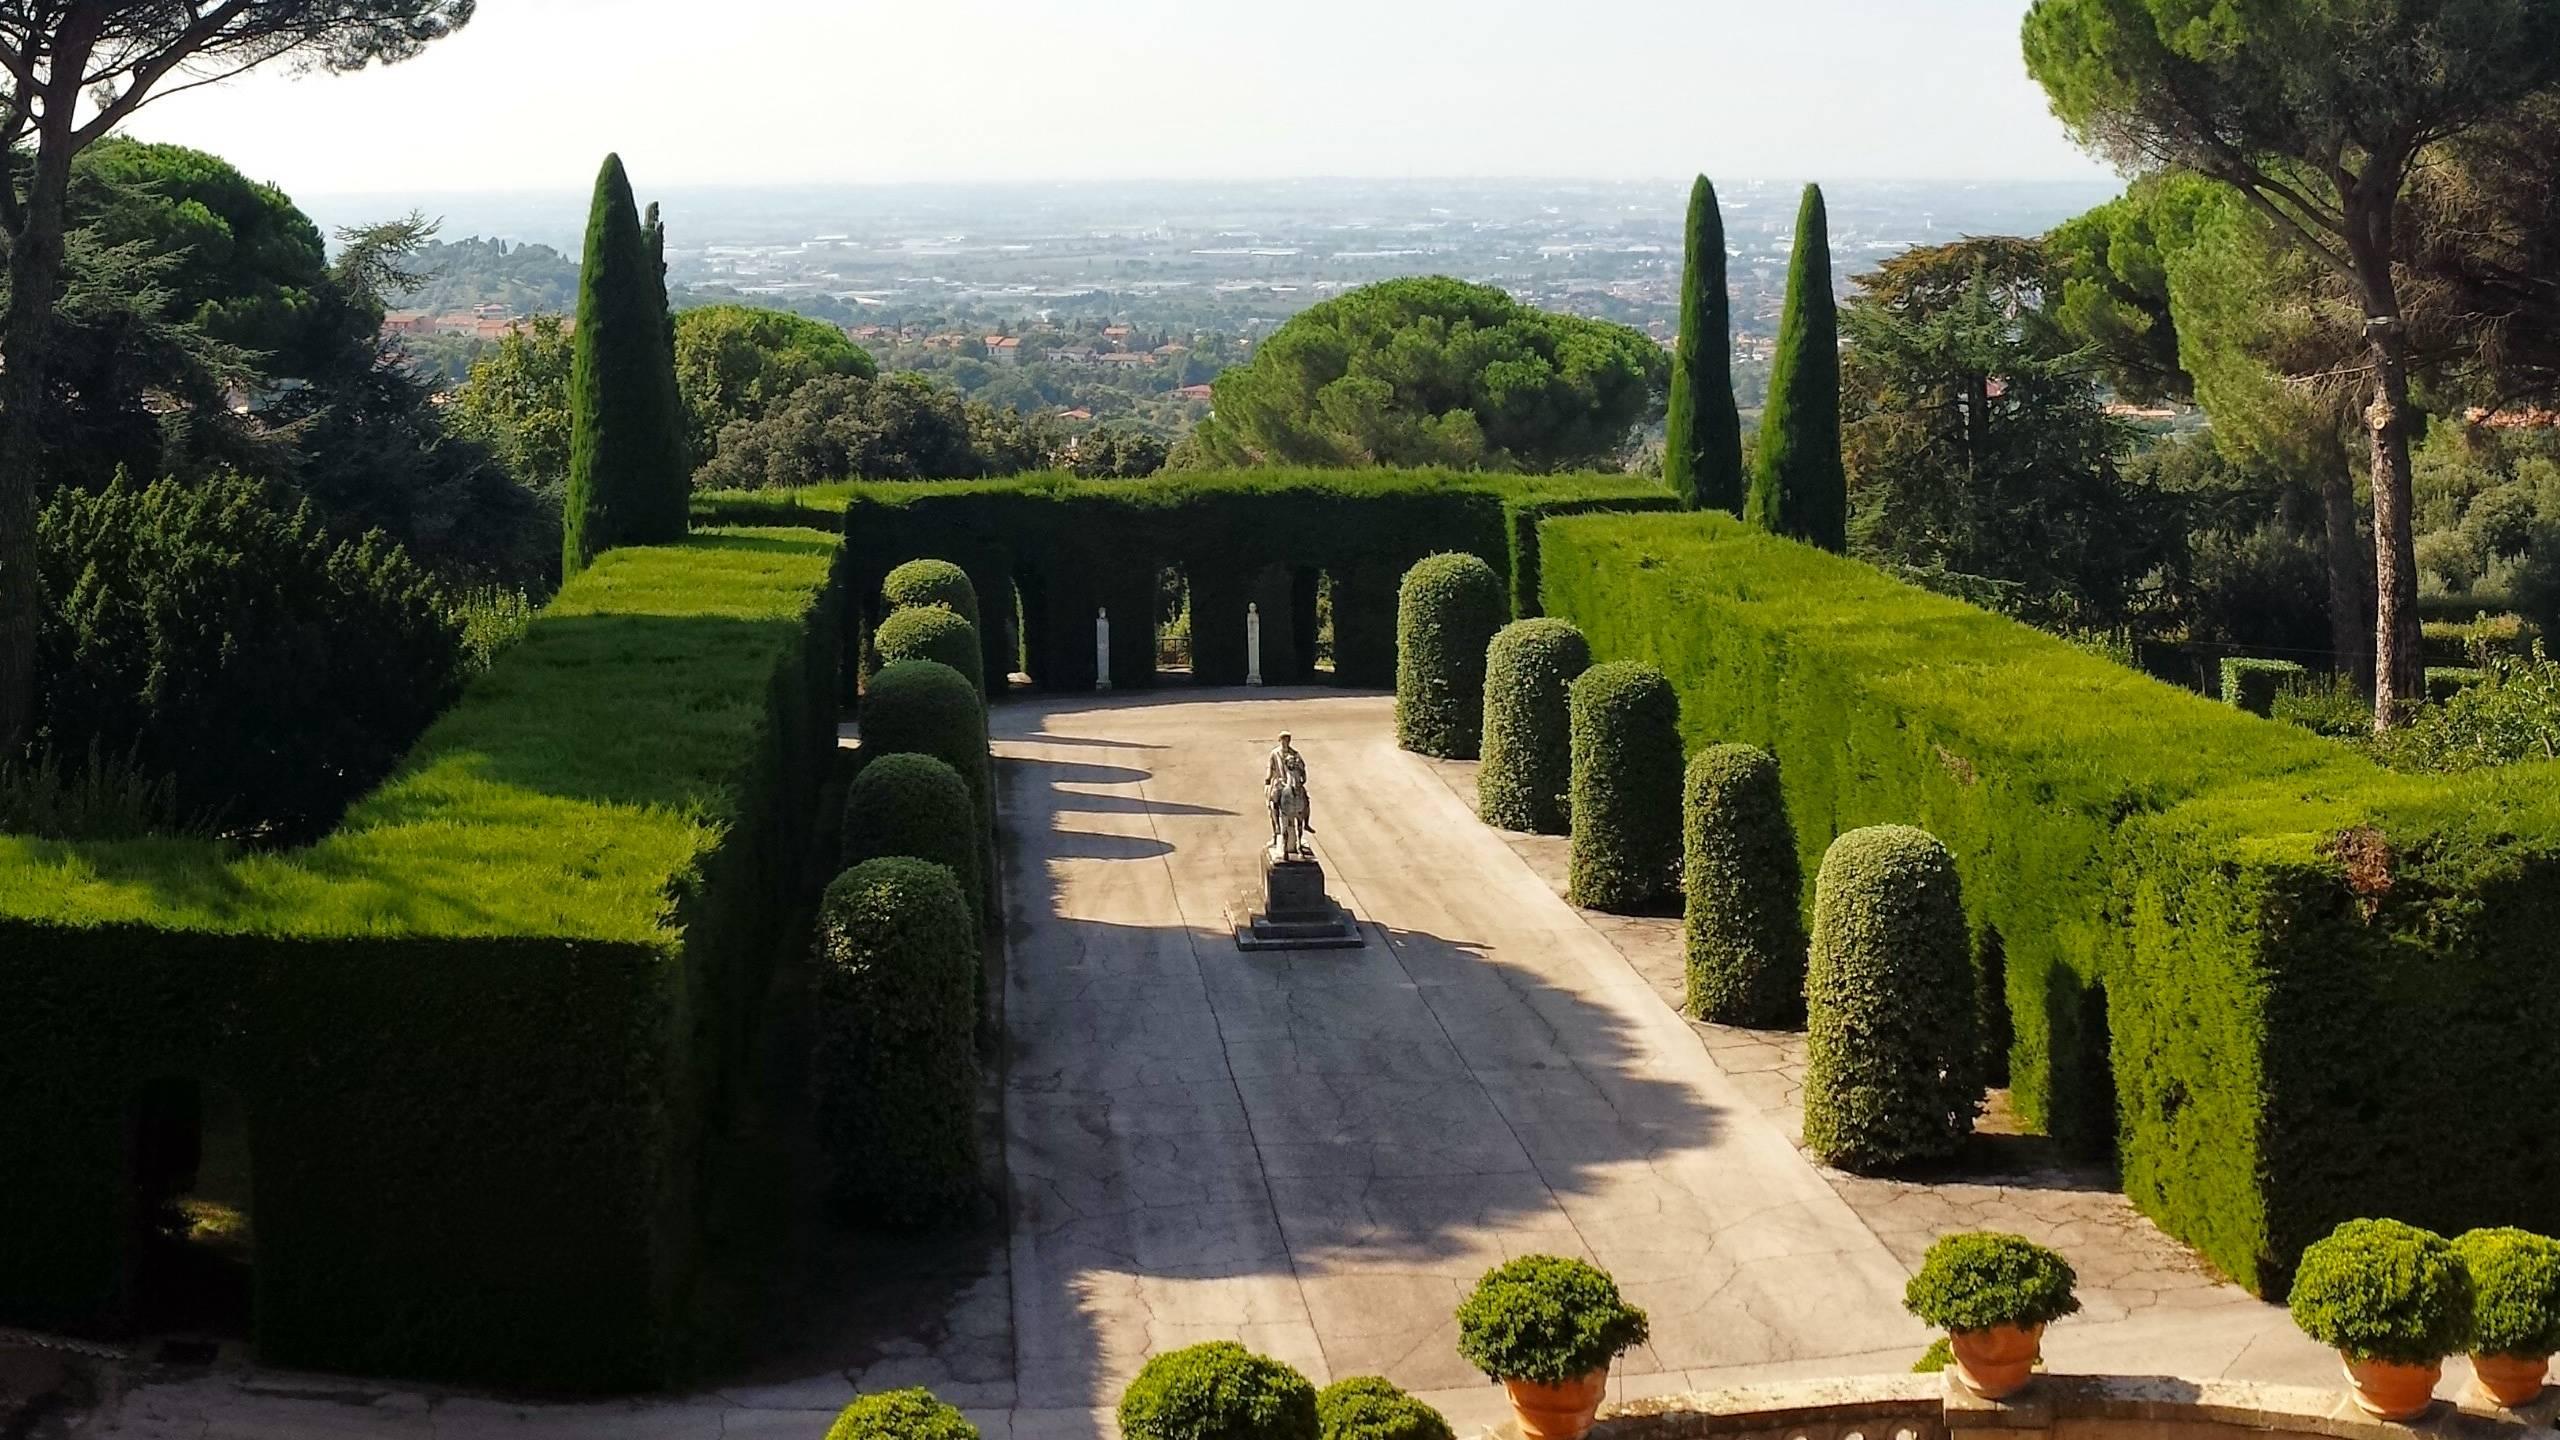 Hotel-Colonna-Frascati-castel-gandolfo-2